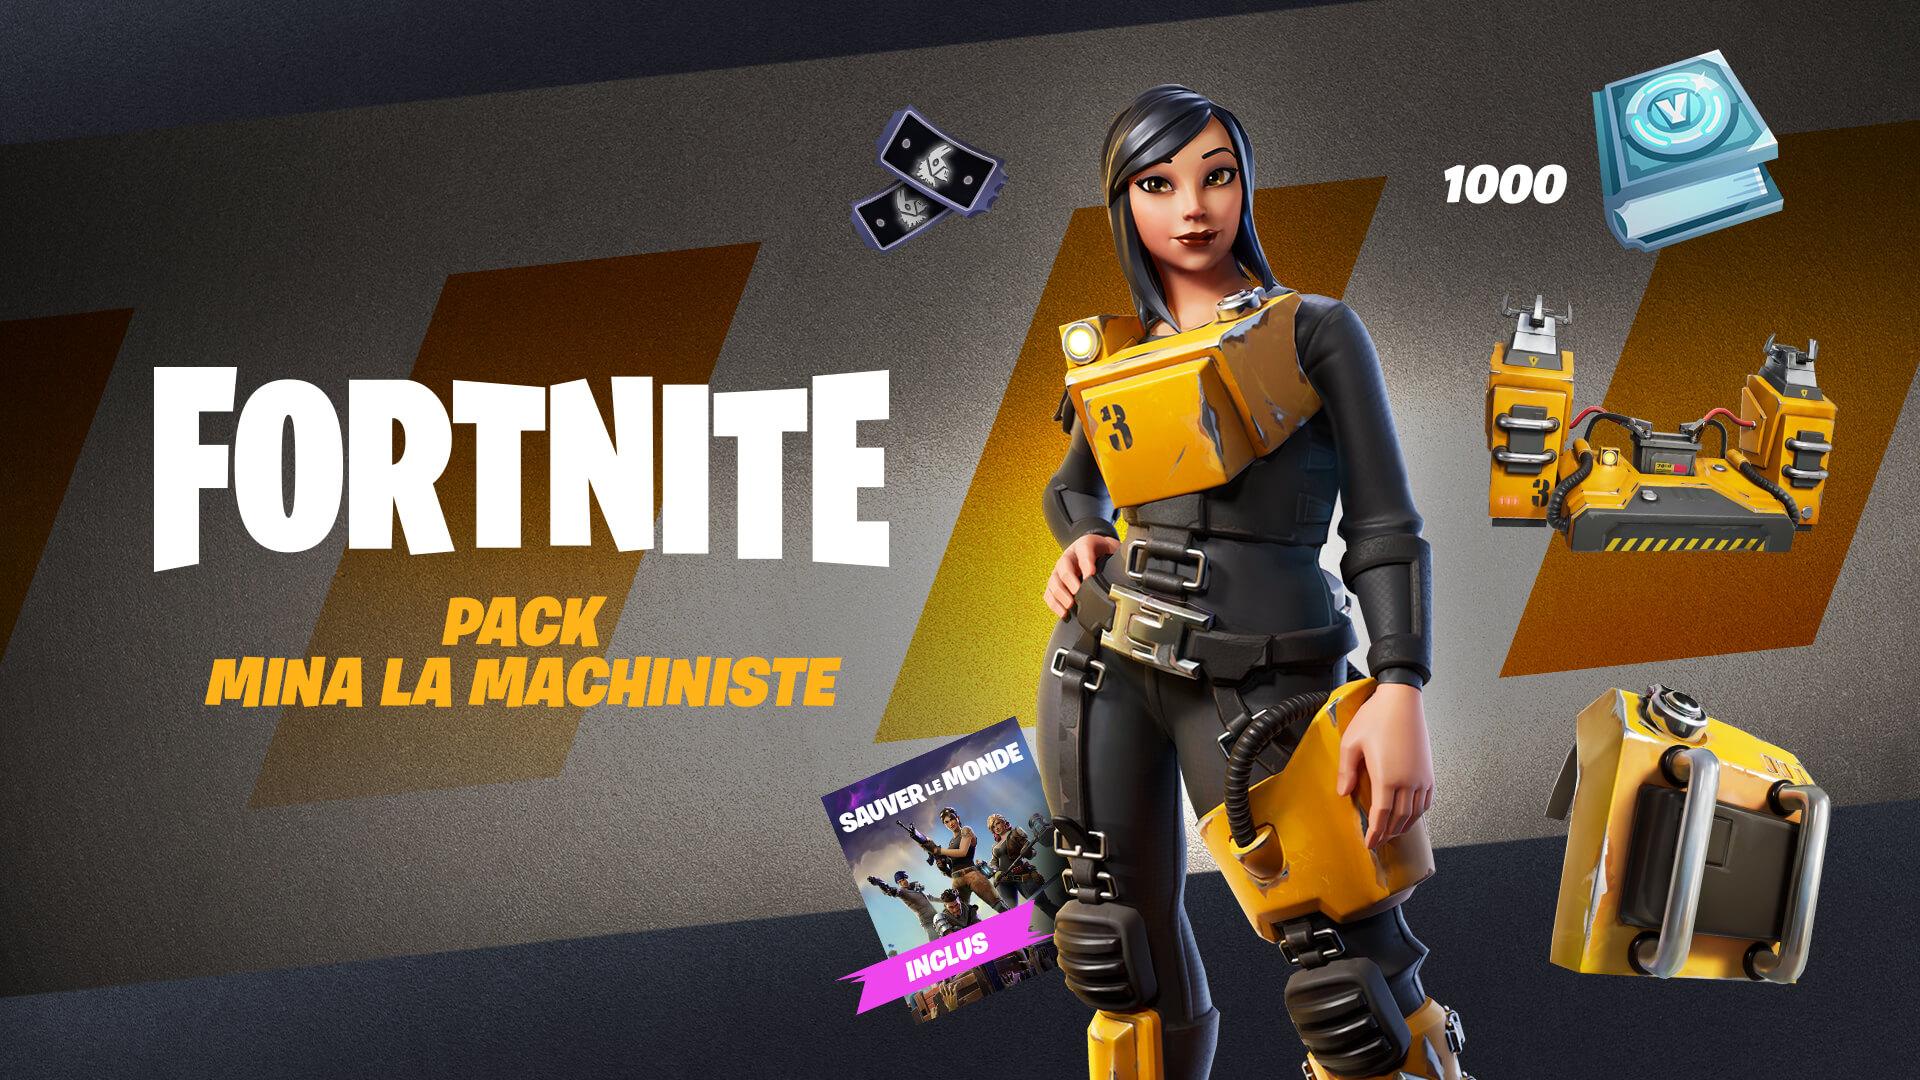 Fortnite Save The World Machinist Mina Pack FR